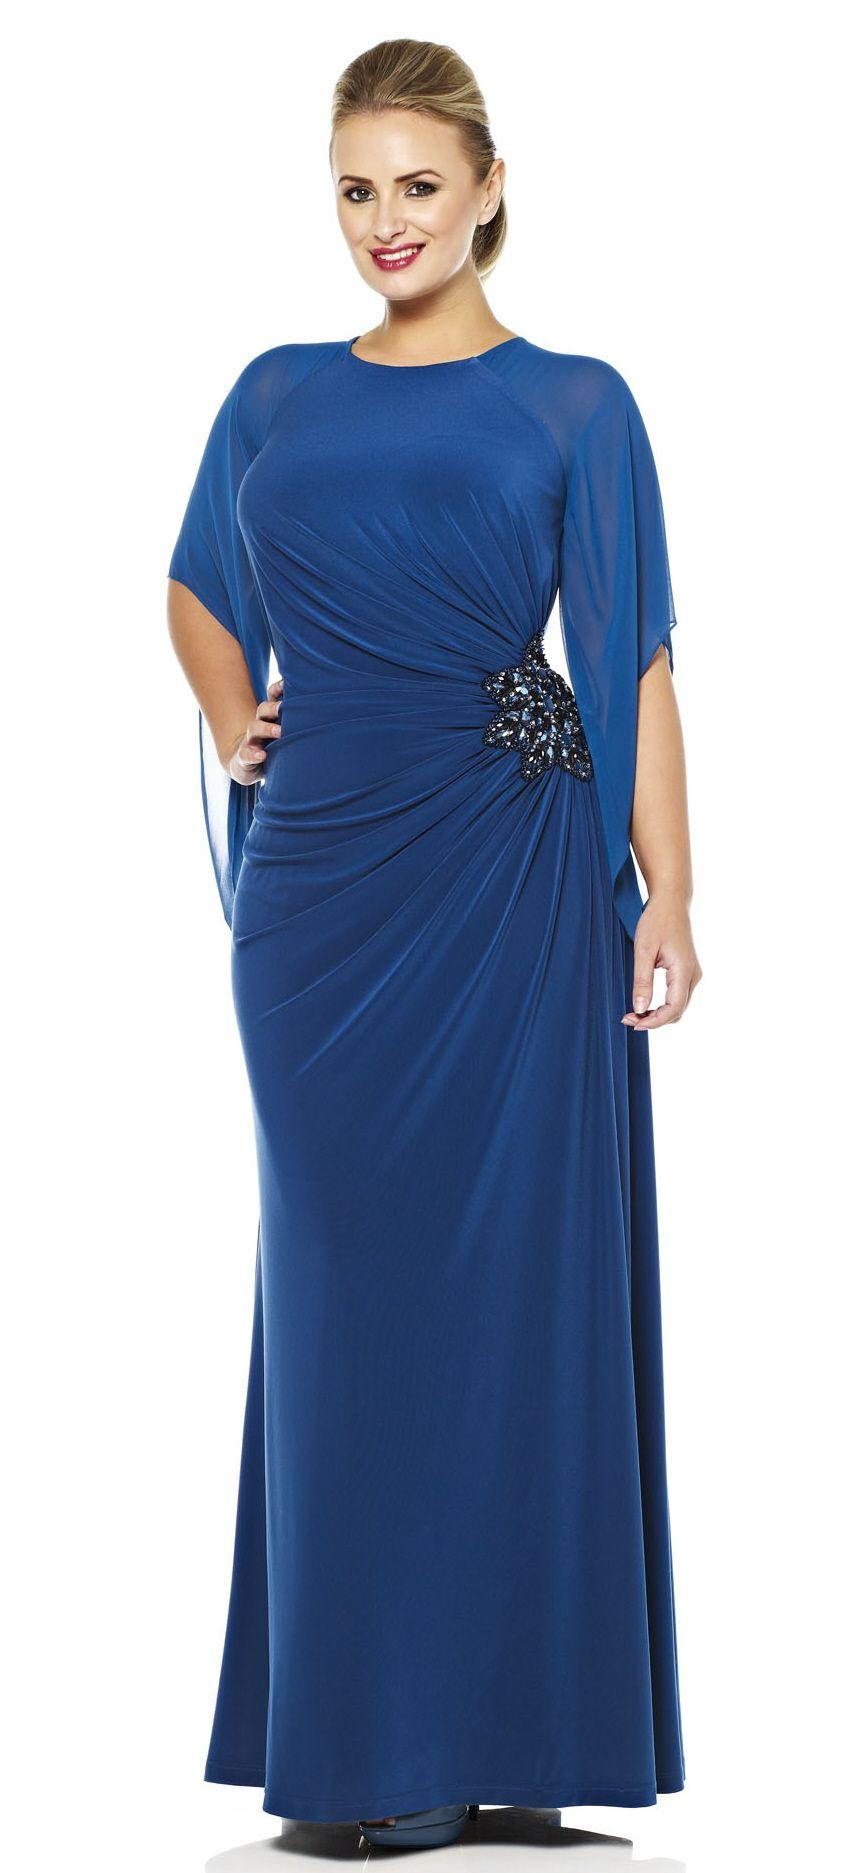 5d0c4addc0 www.ballgownheaven.co.uk evening-dresses 230 plus-size-jersey-evening-dress